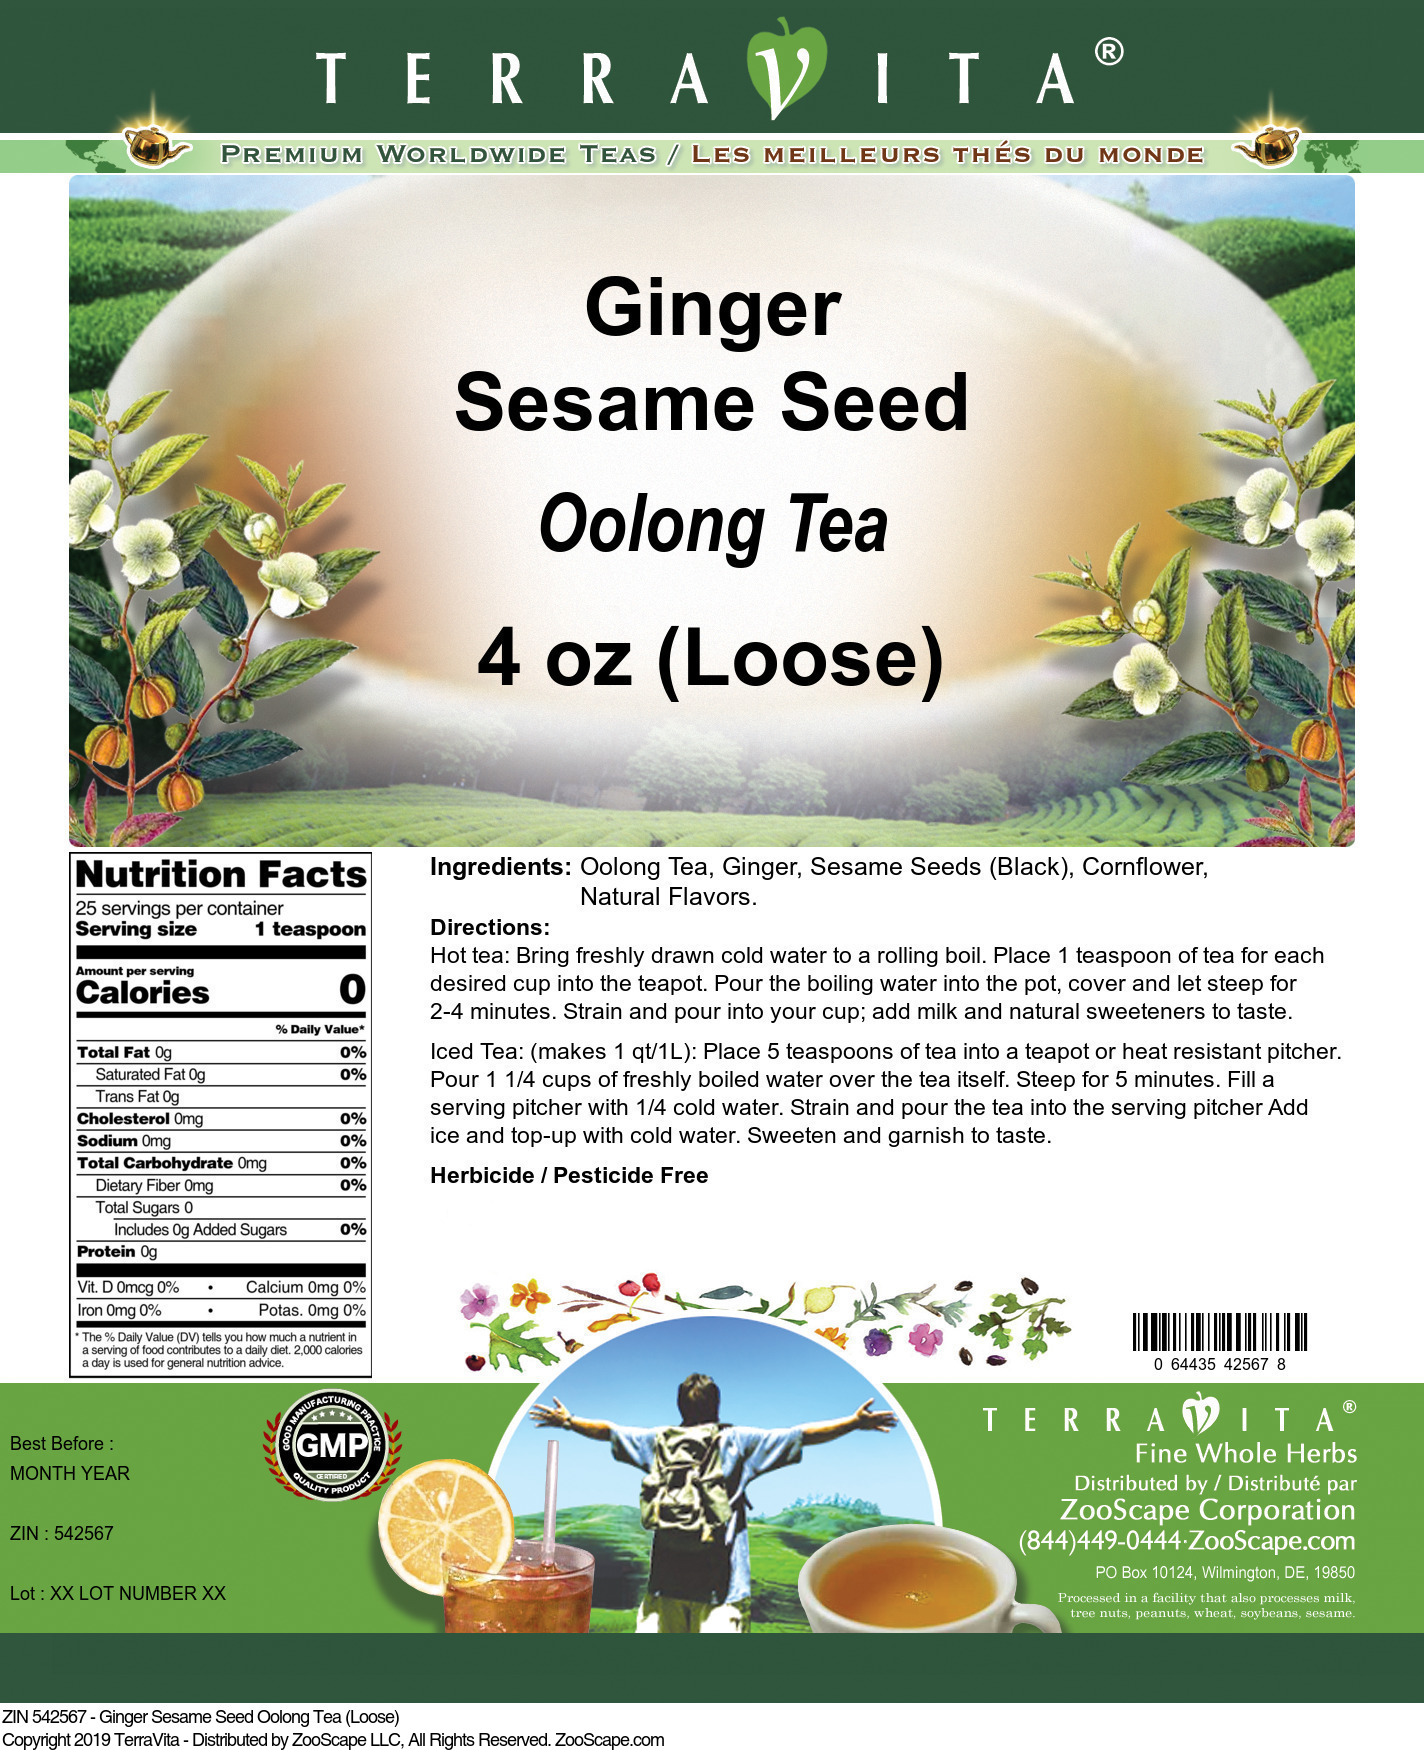 Ginger Sesame Seed Oolong Tea (Loose)